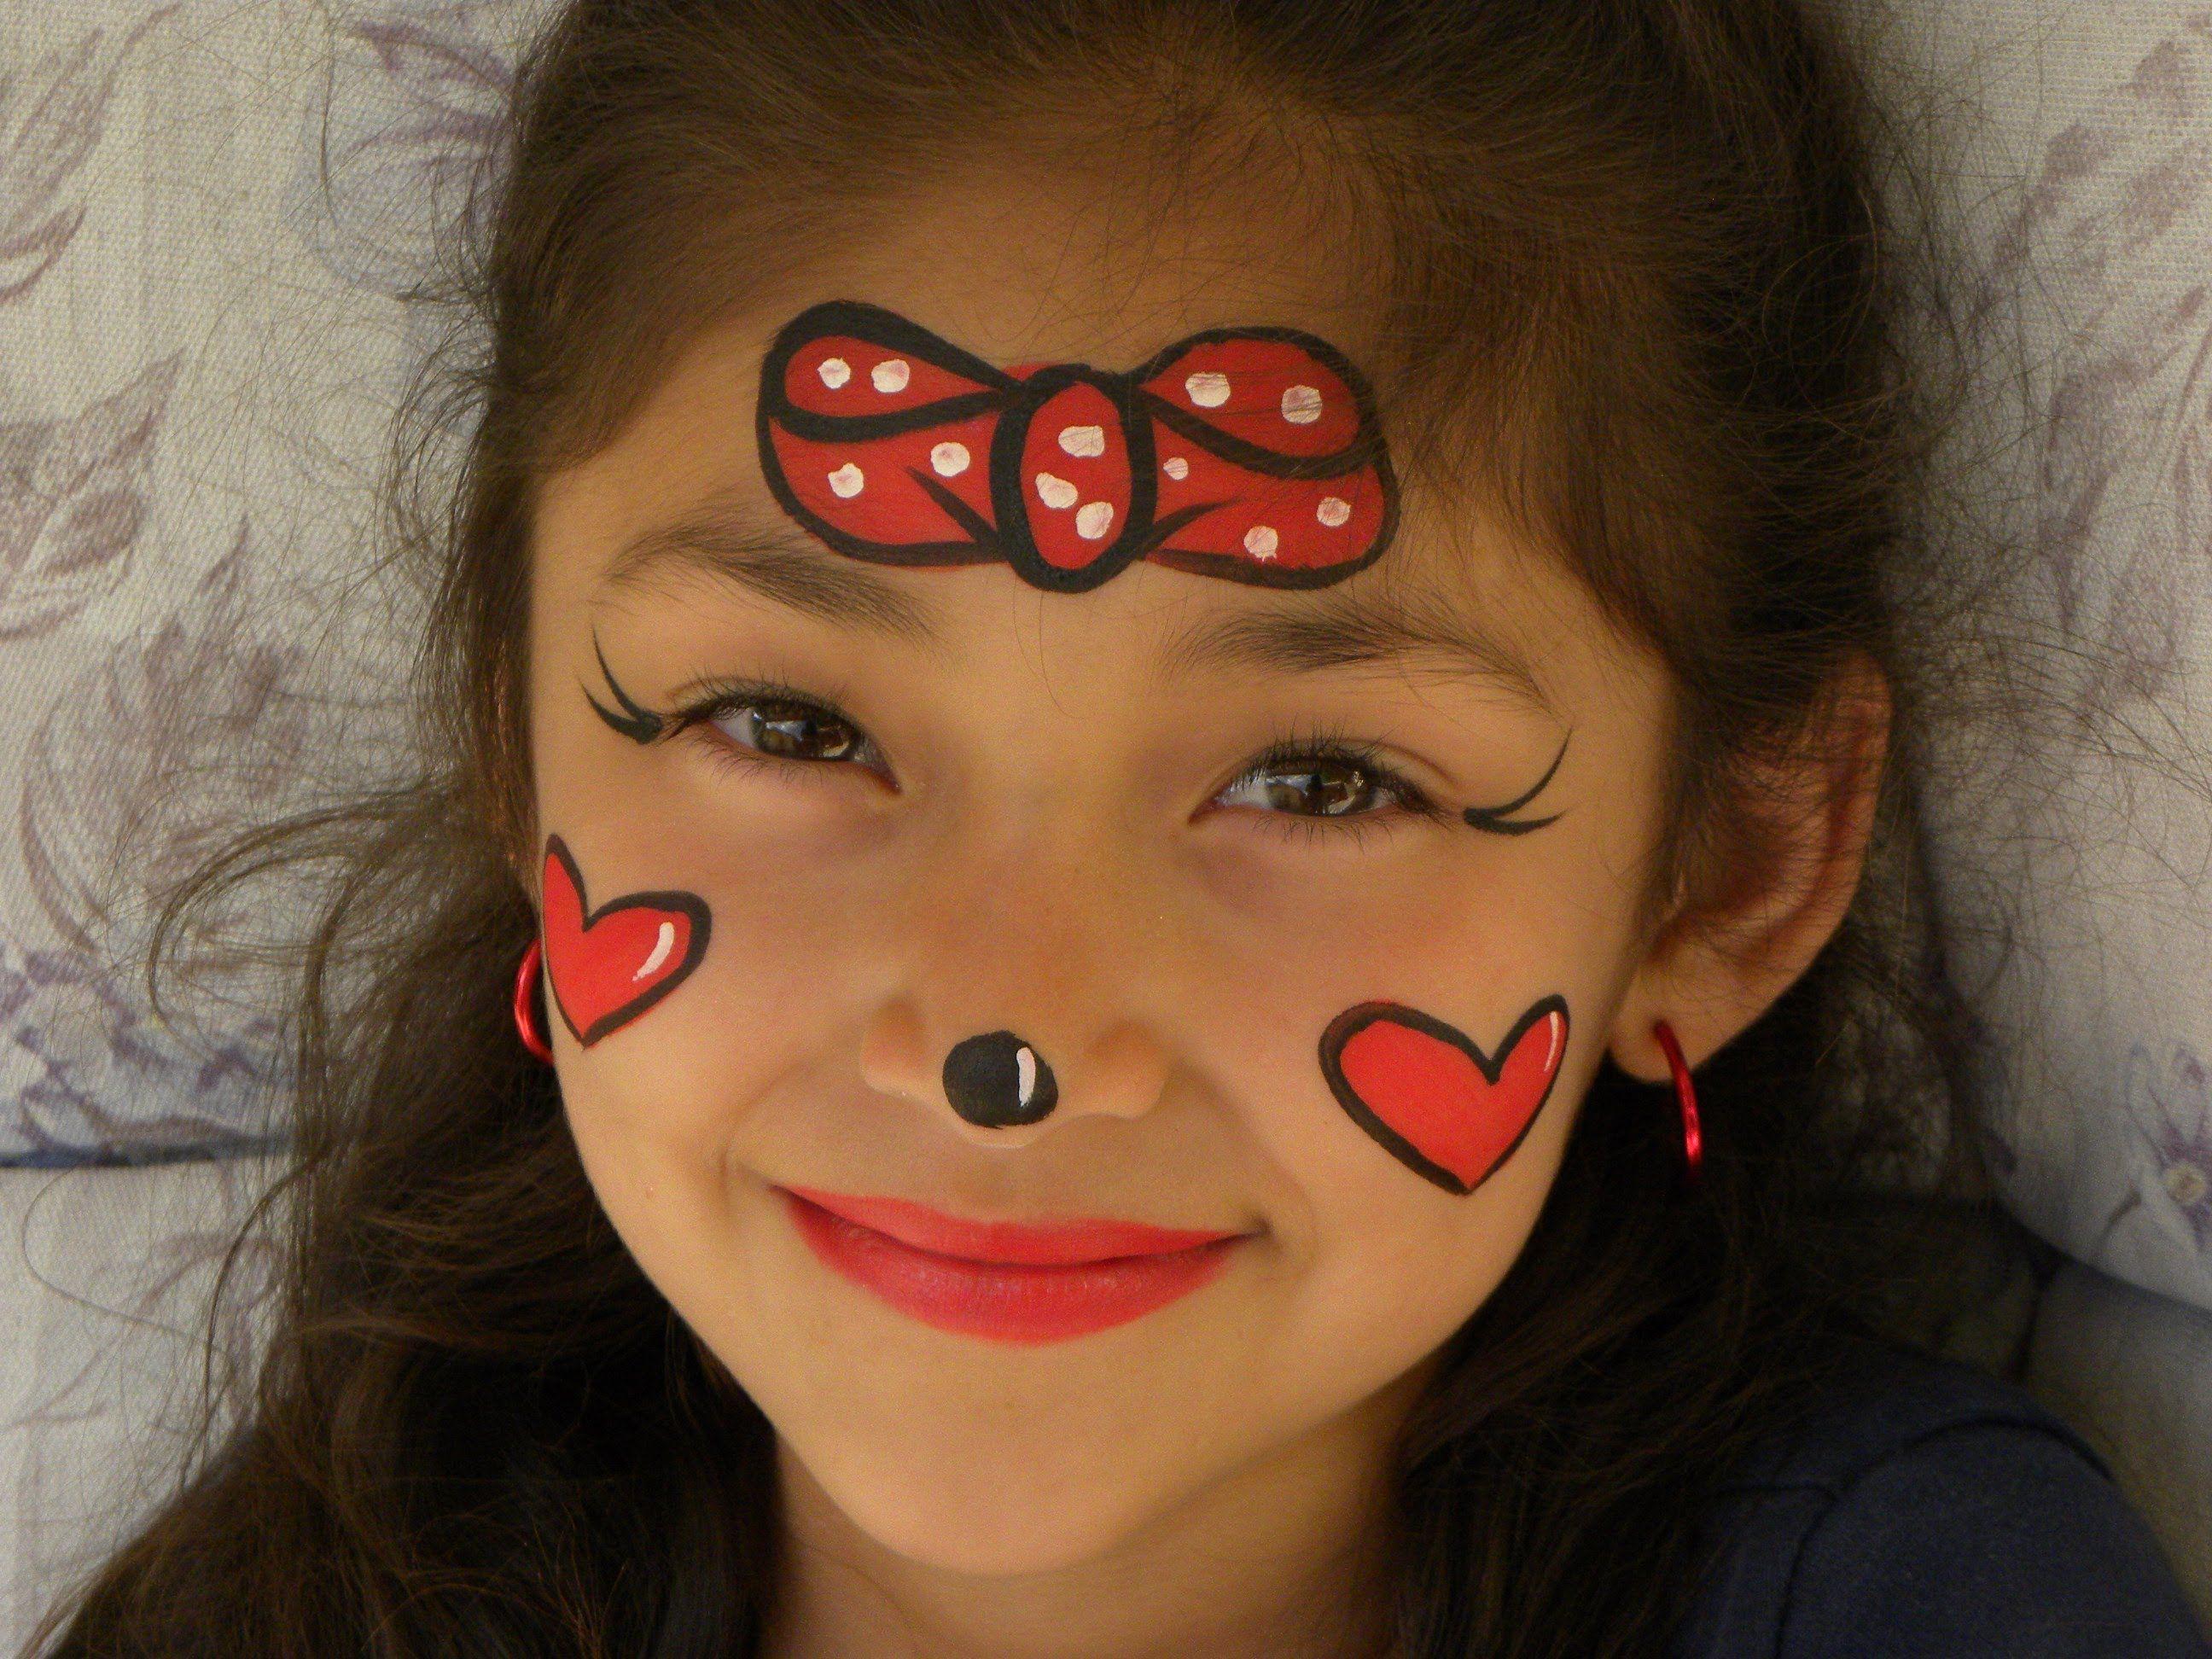 Pintacaritas de minnie mouse face painting diy - Fiesta de disfraces ideas ...